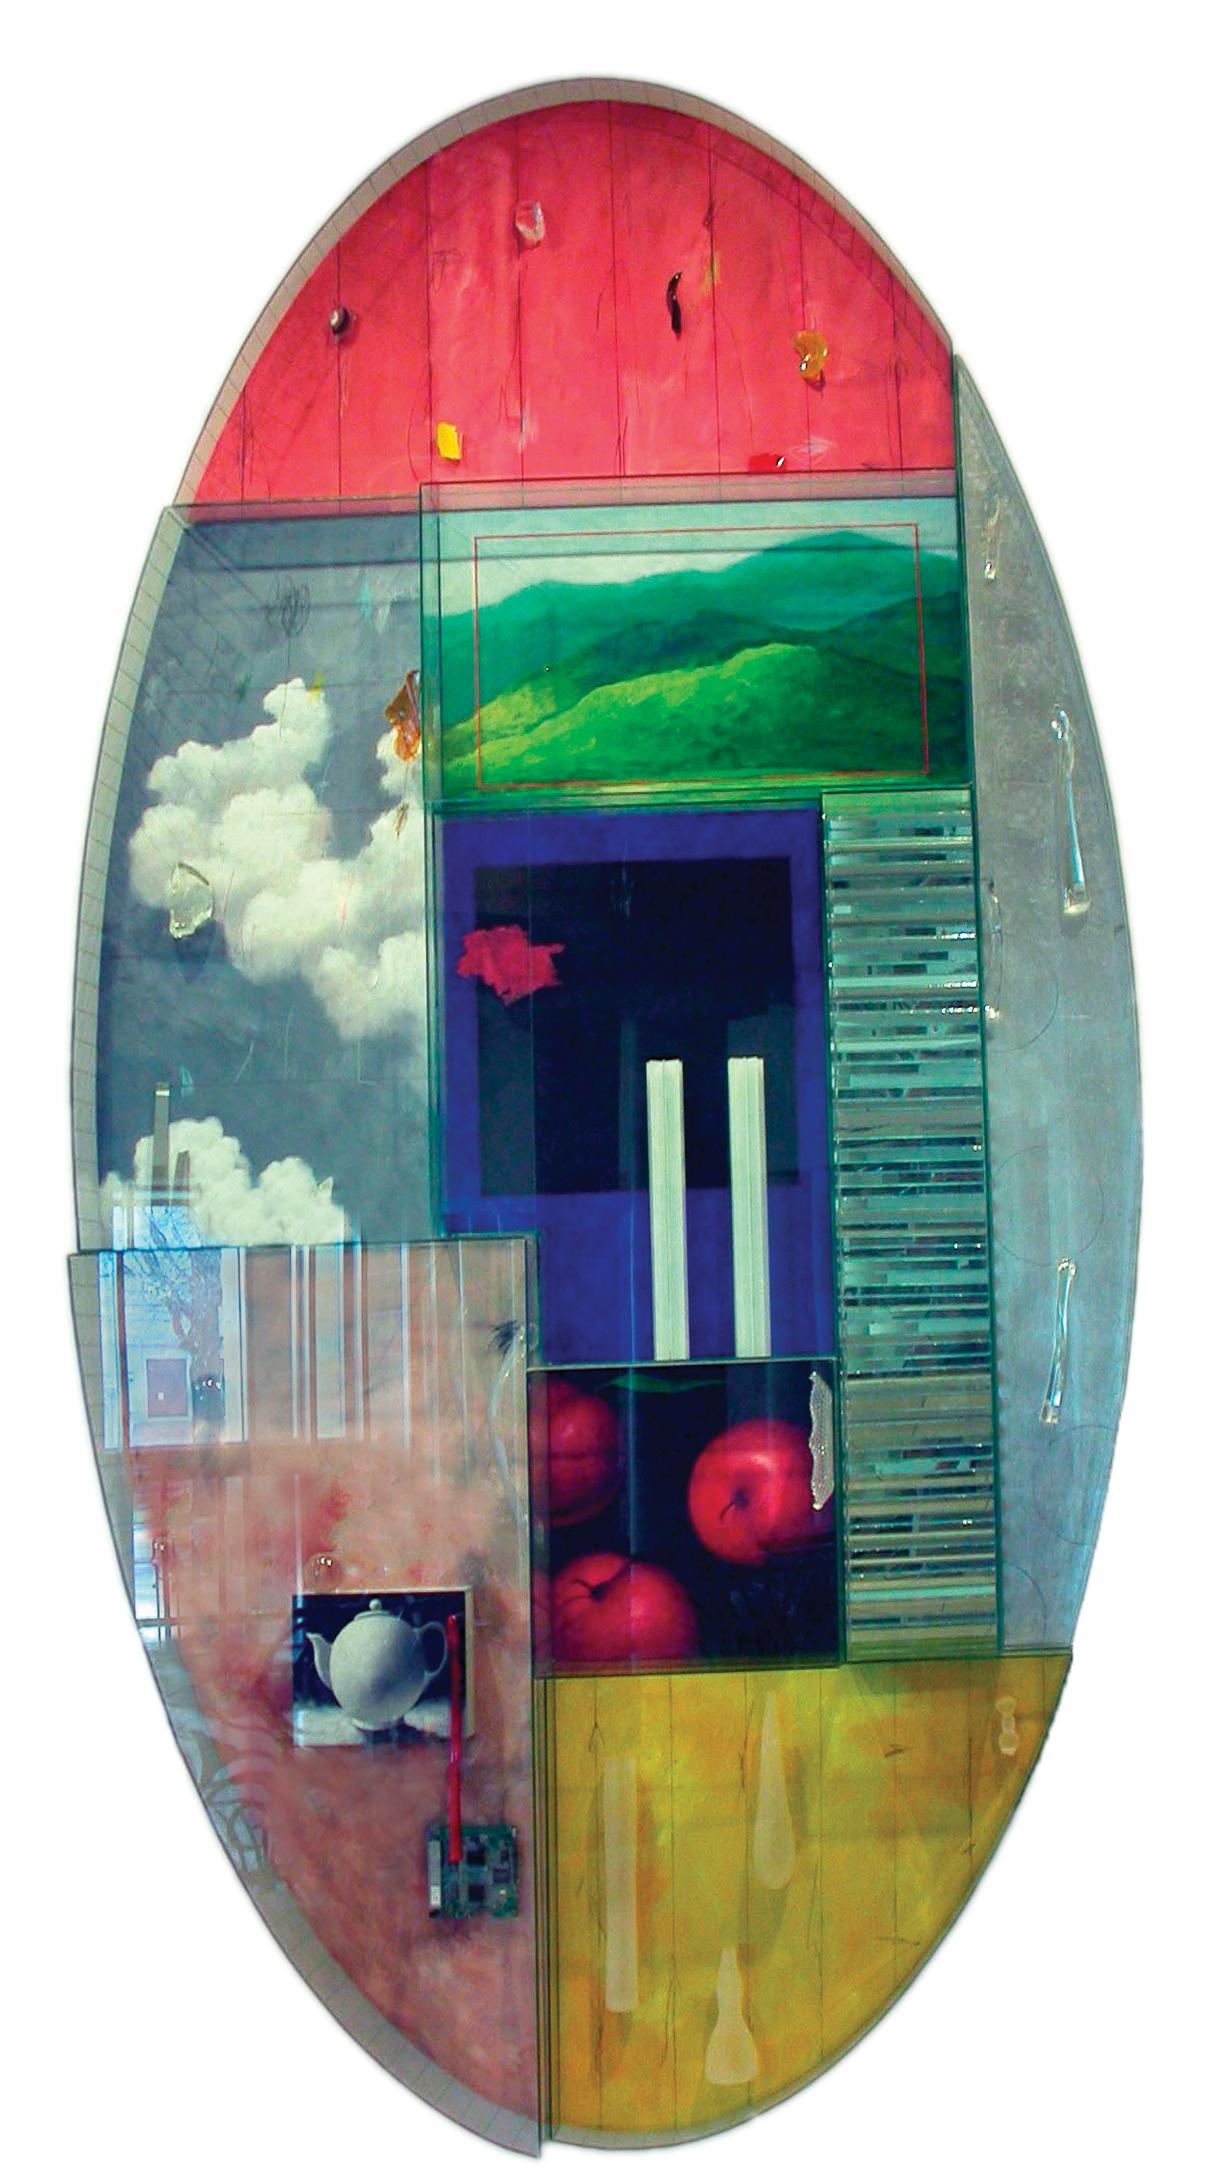 Therman Statom (American, born 1953), Ovala Marea, 2004